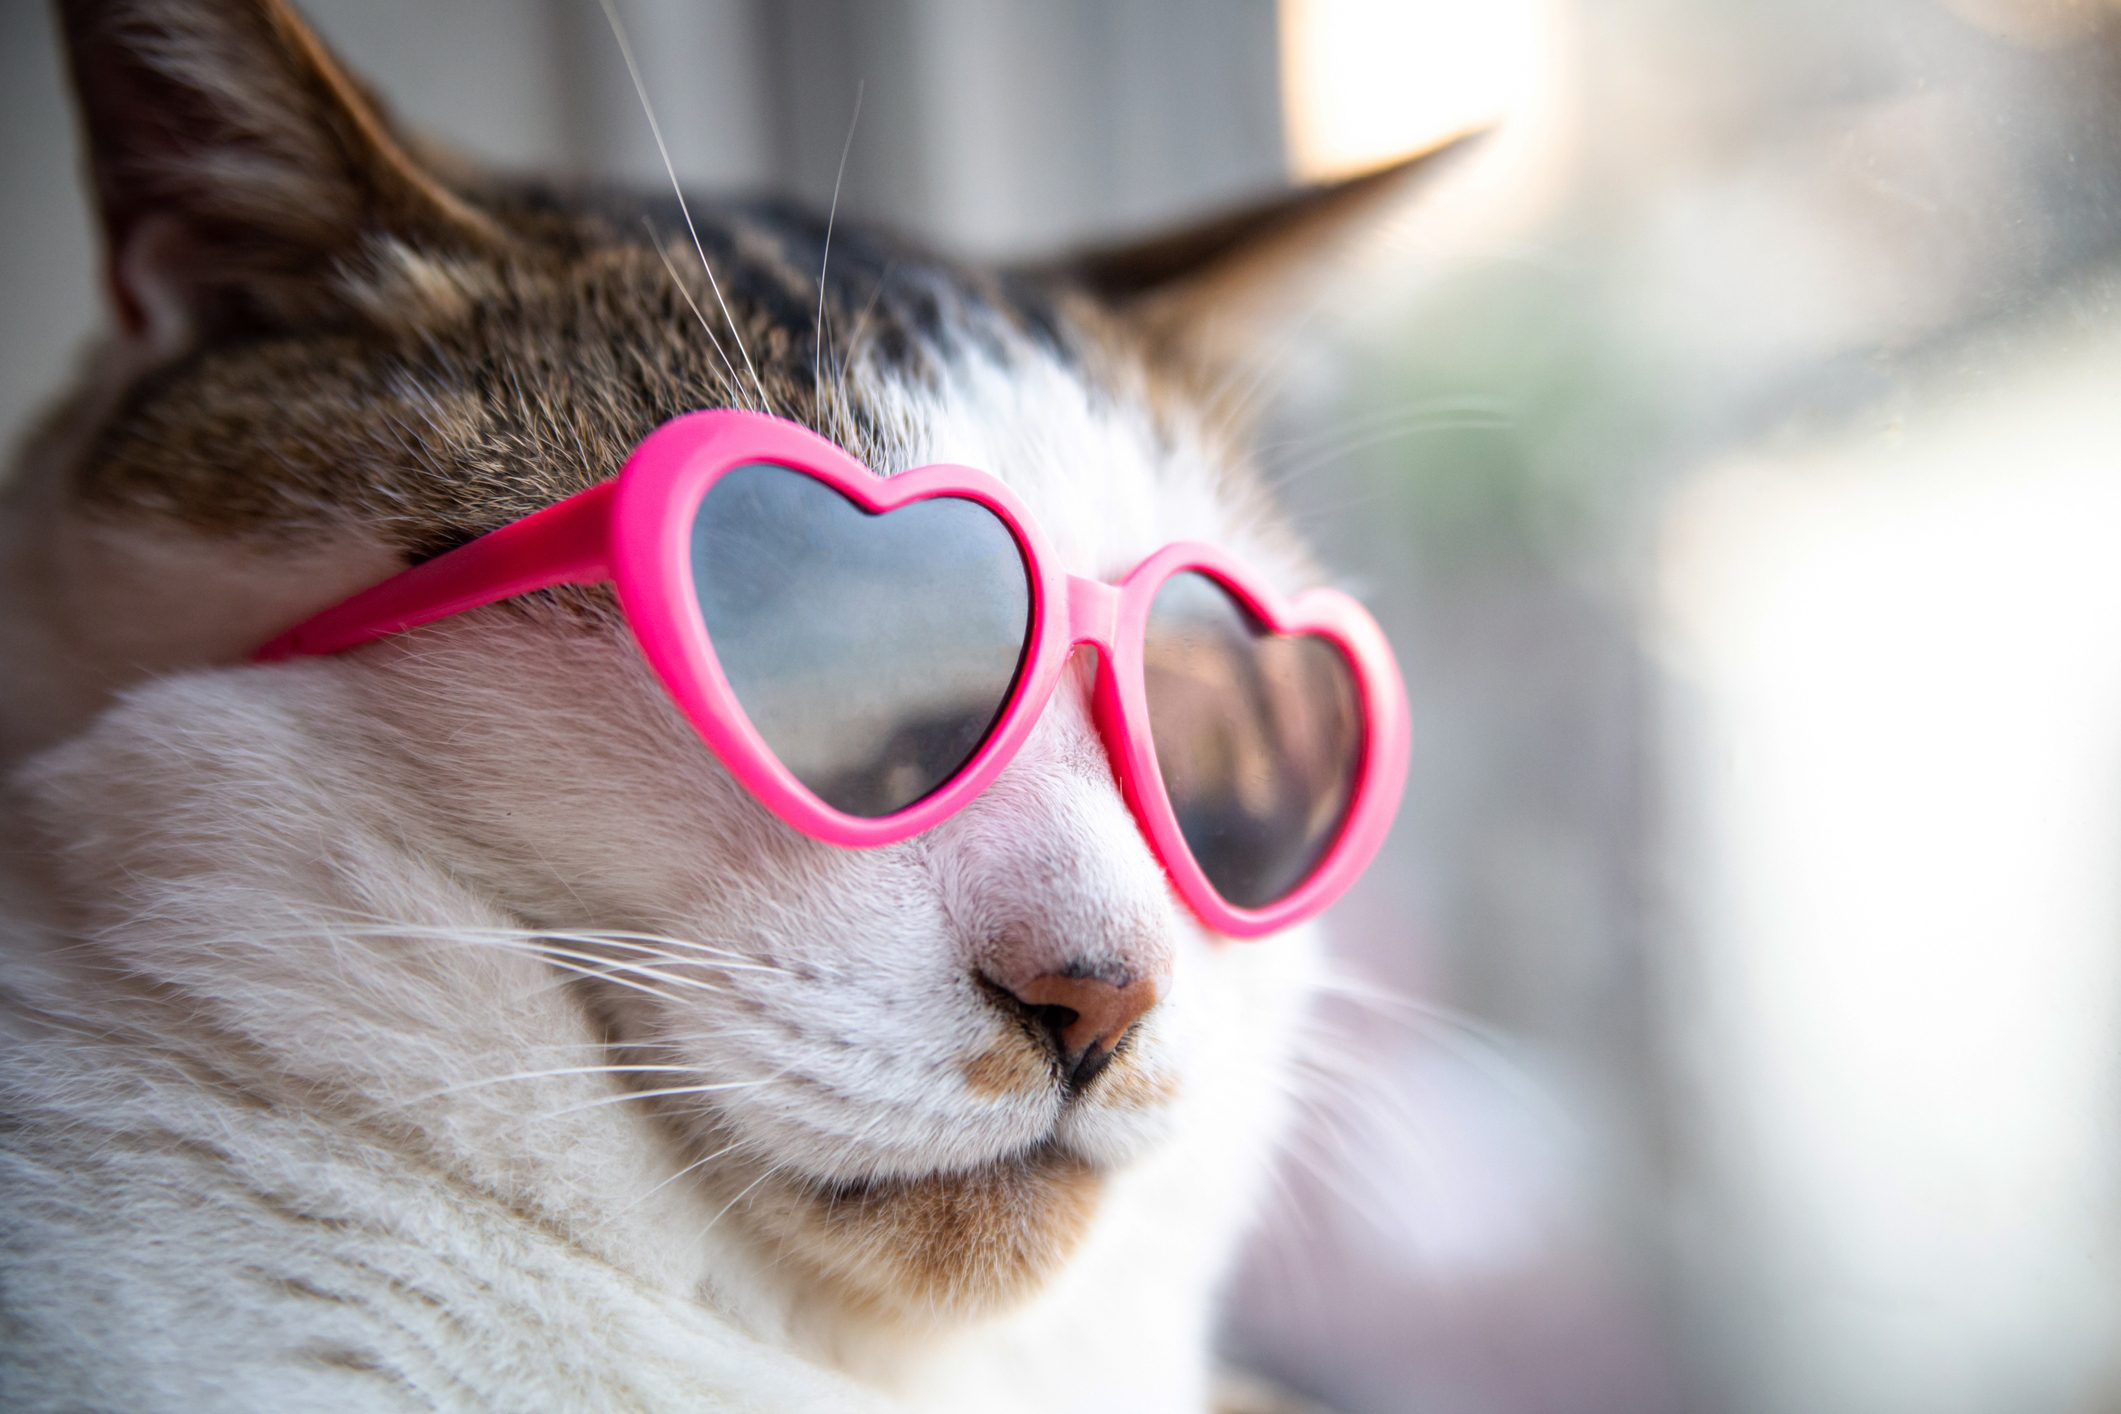 Cat wearing heart shaped sunglasses